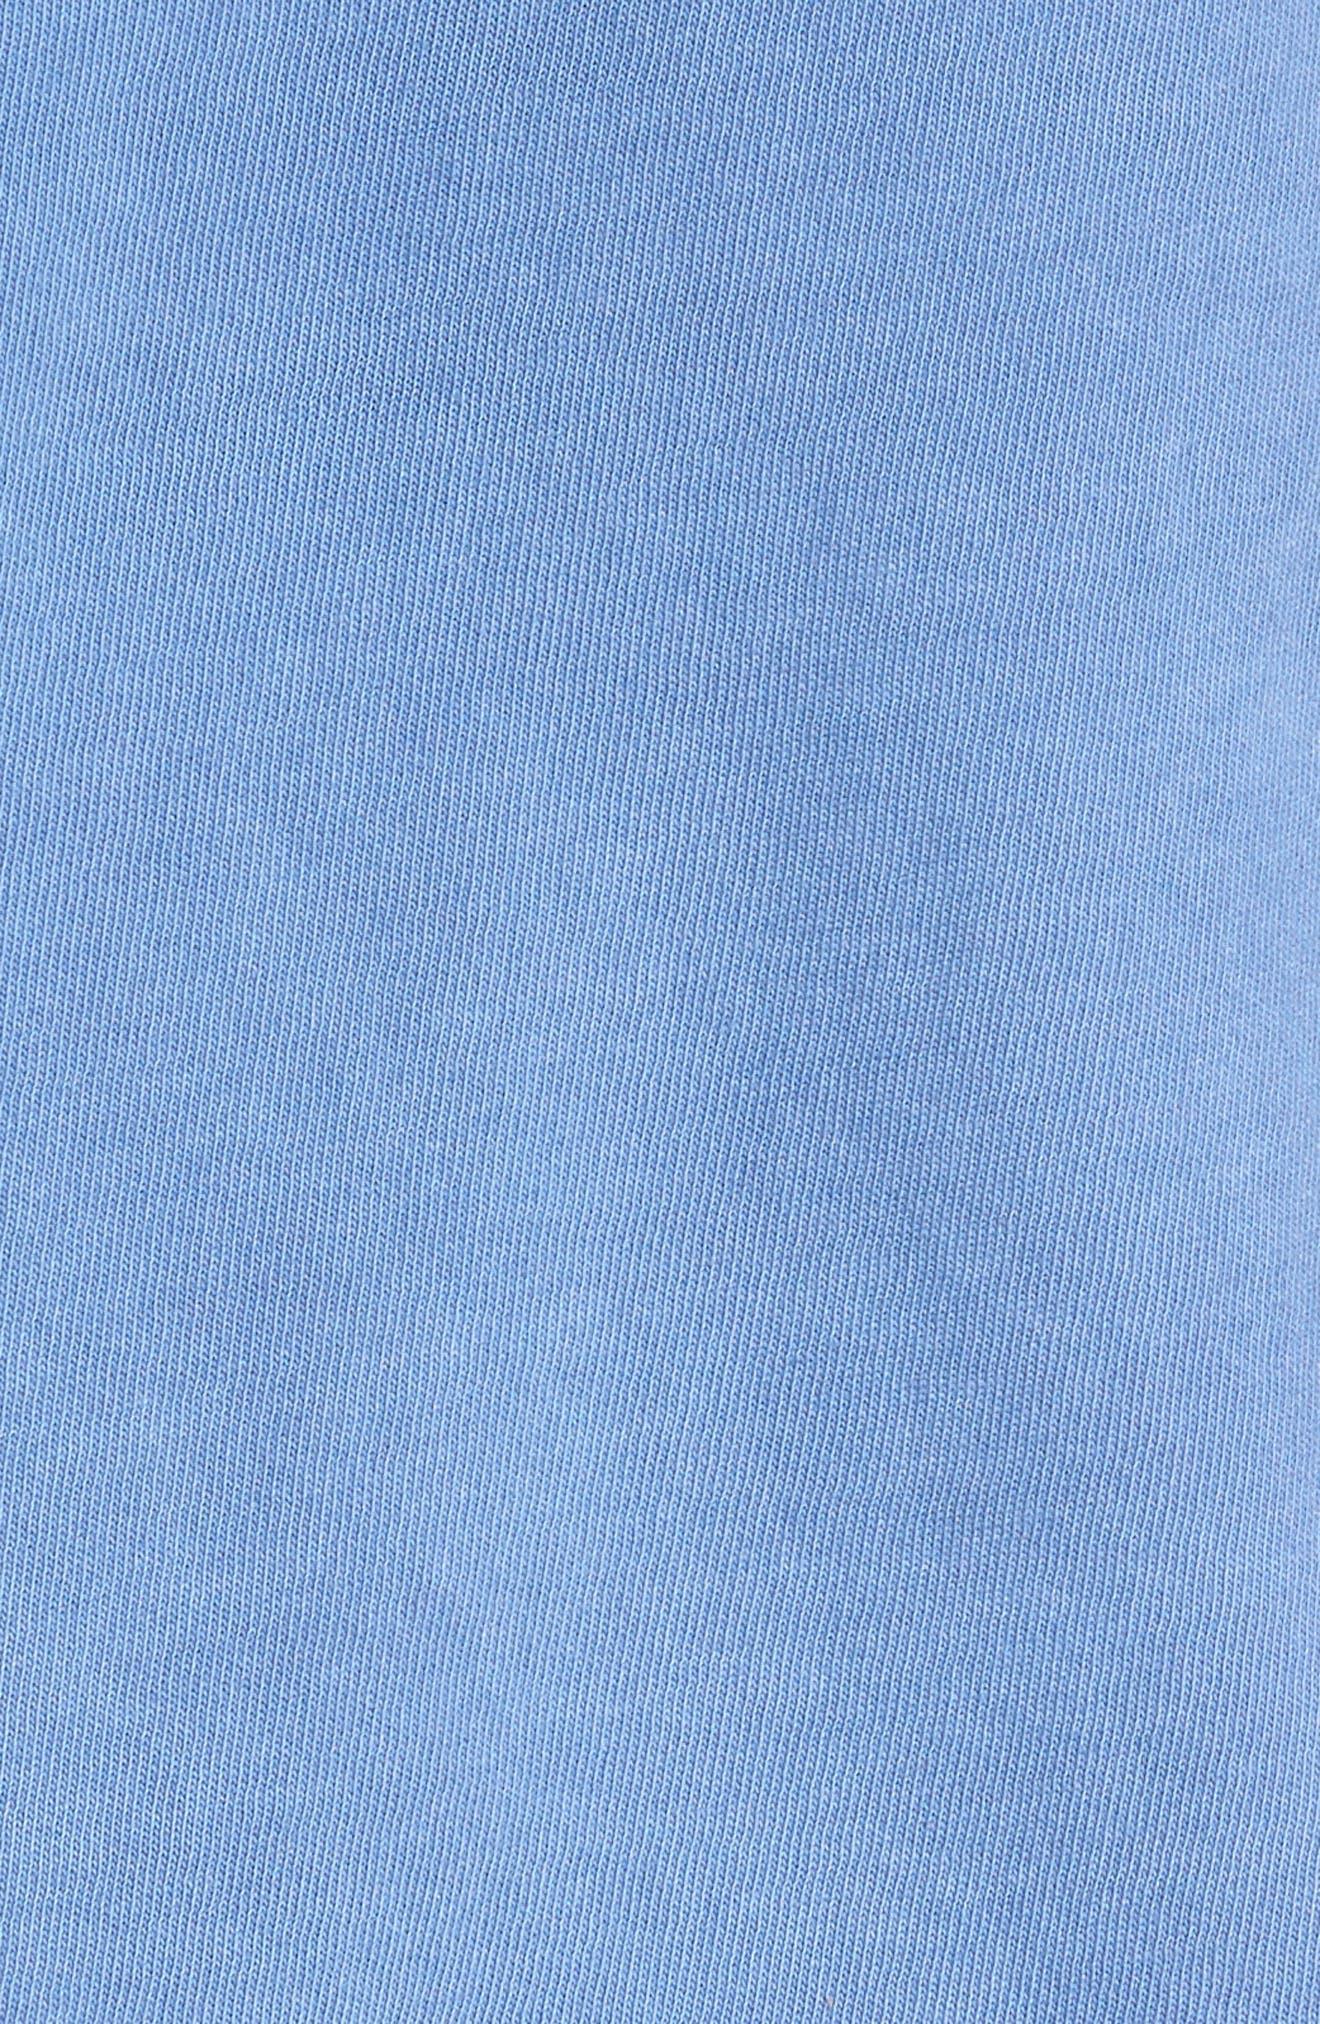 Alternate Image 5  - Vans California Classic Co. Overdye T-Shirt